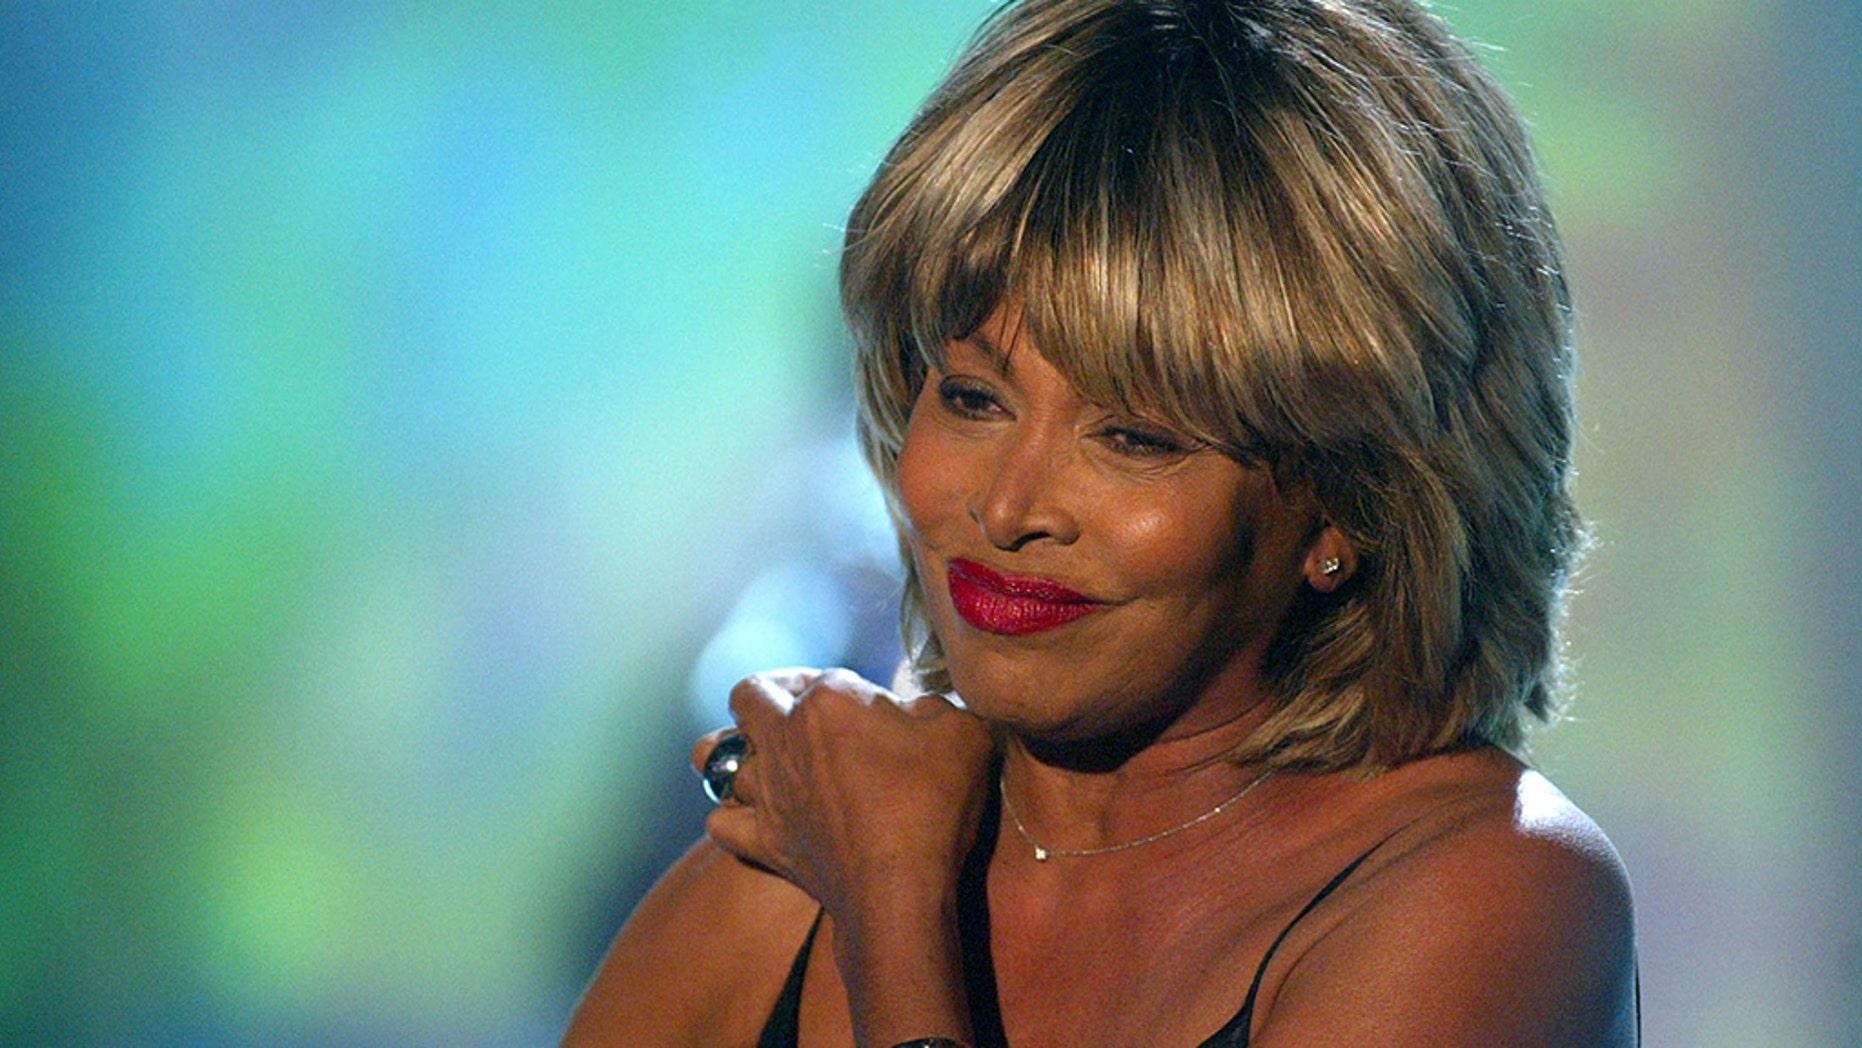 Tina Turner's oldest son, Craig, found dead at 59.